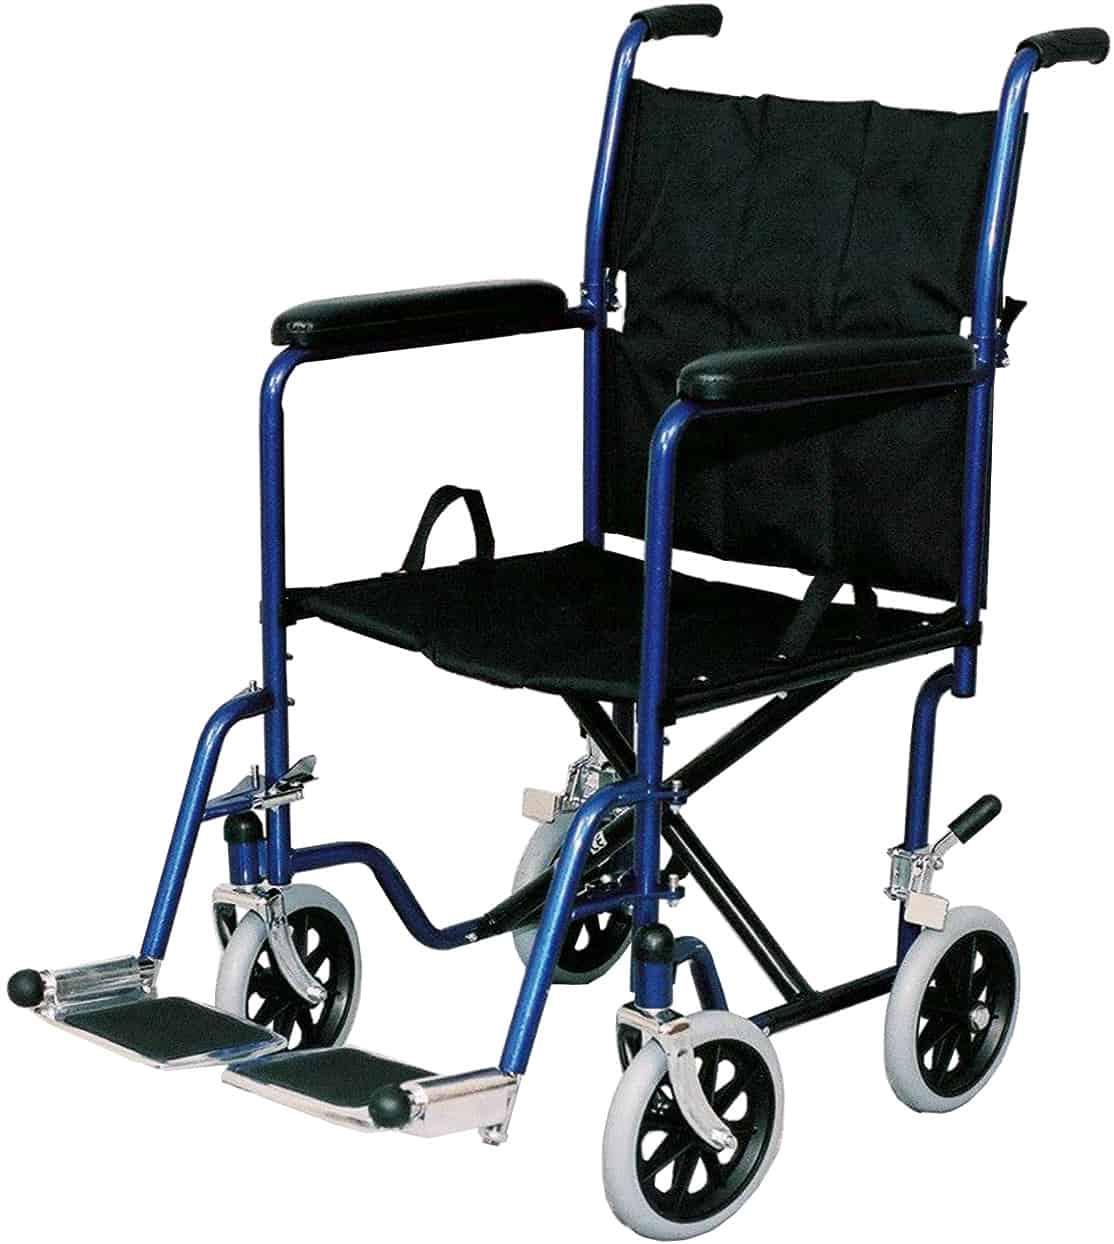 Companion Wheelchair  All Seasons Rent All